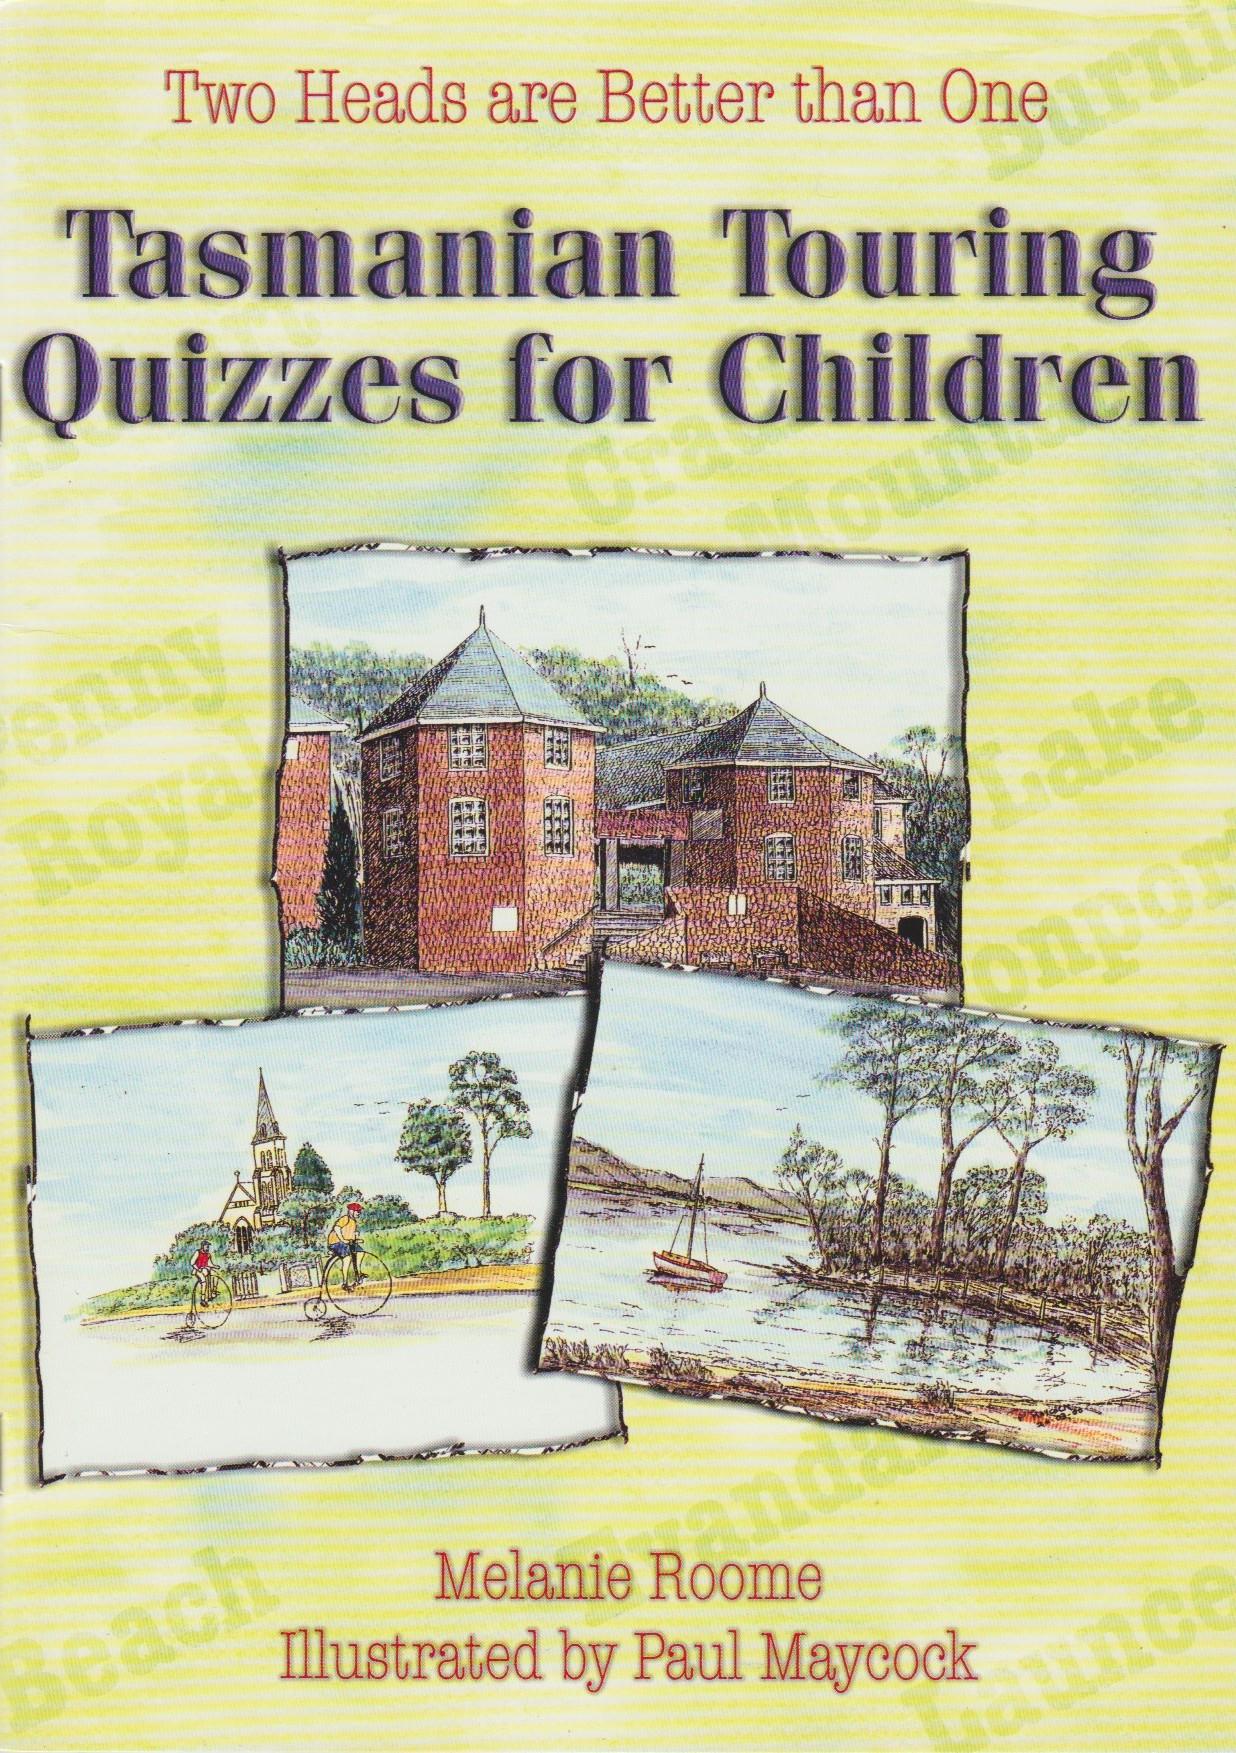 Tasmanian Touring Quizzes for Children